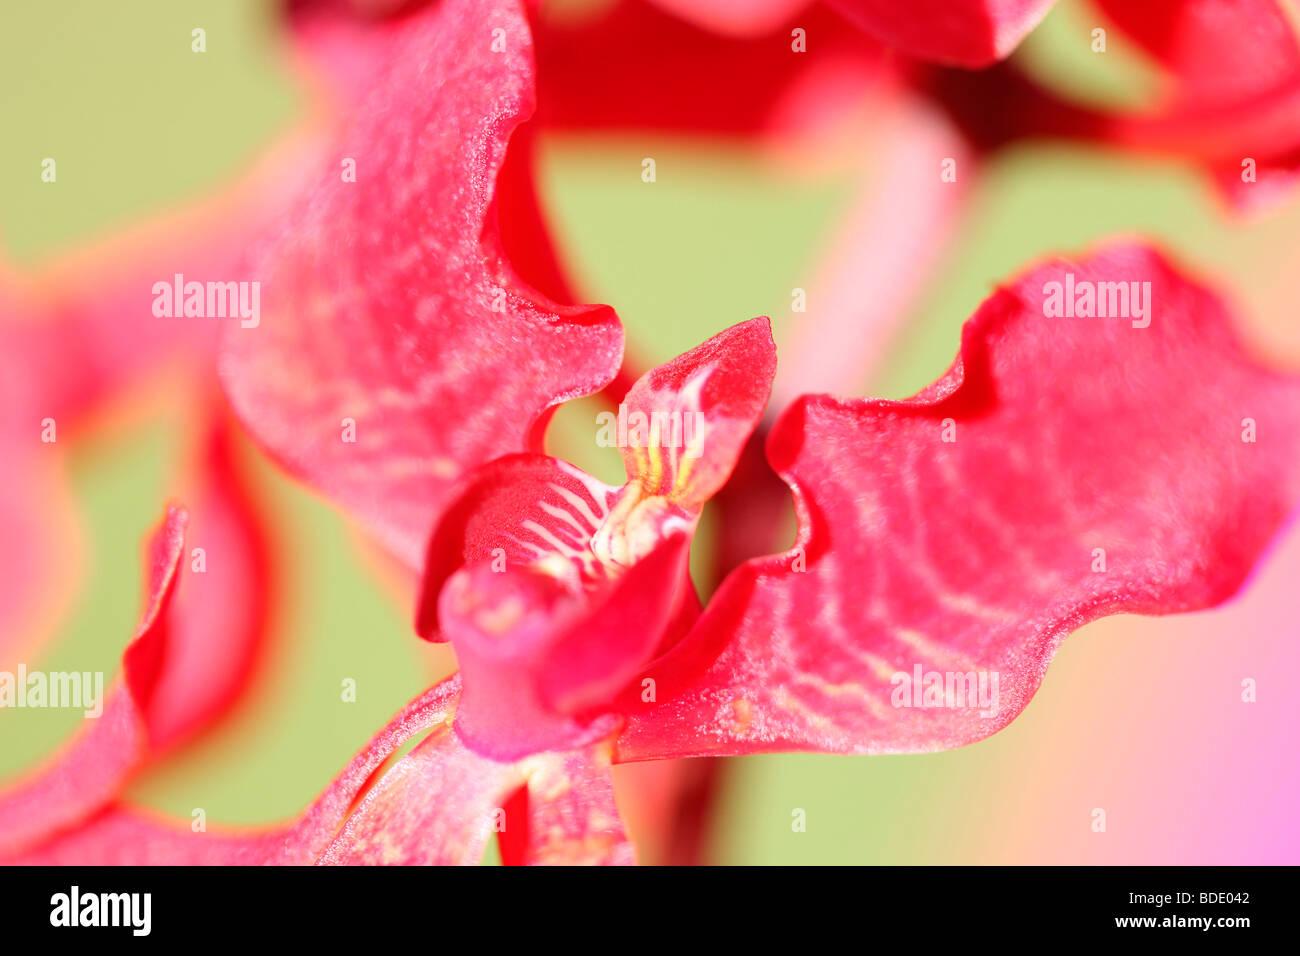 amazing azima mokara orchid - fine art photography Jane-Ann Butler Photography JABP568 - Stock Image